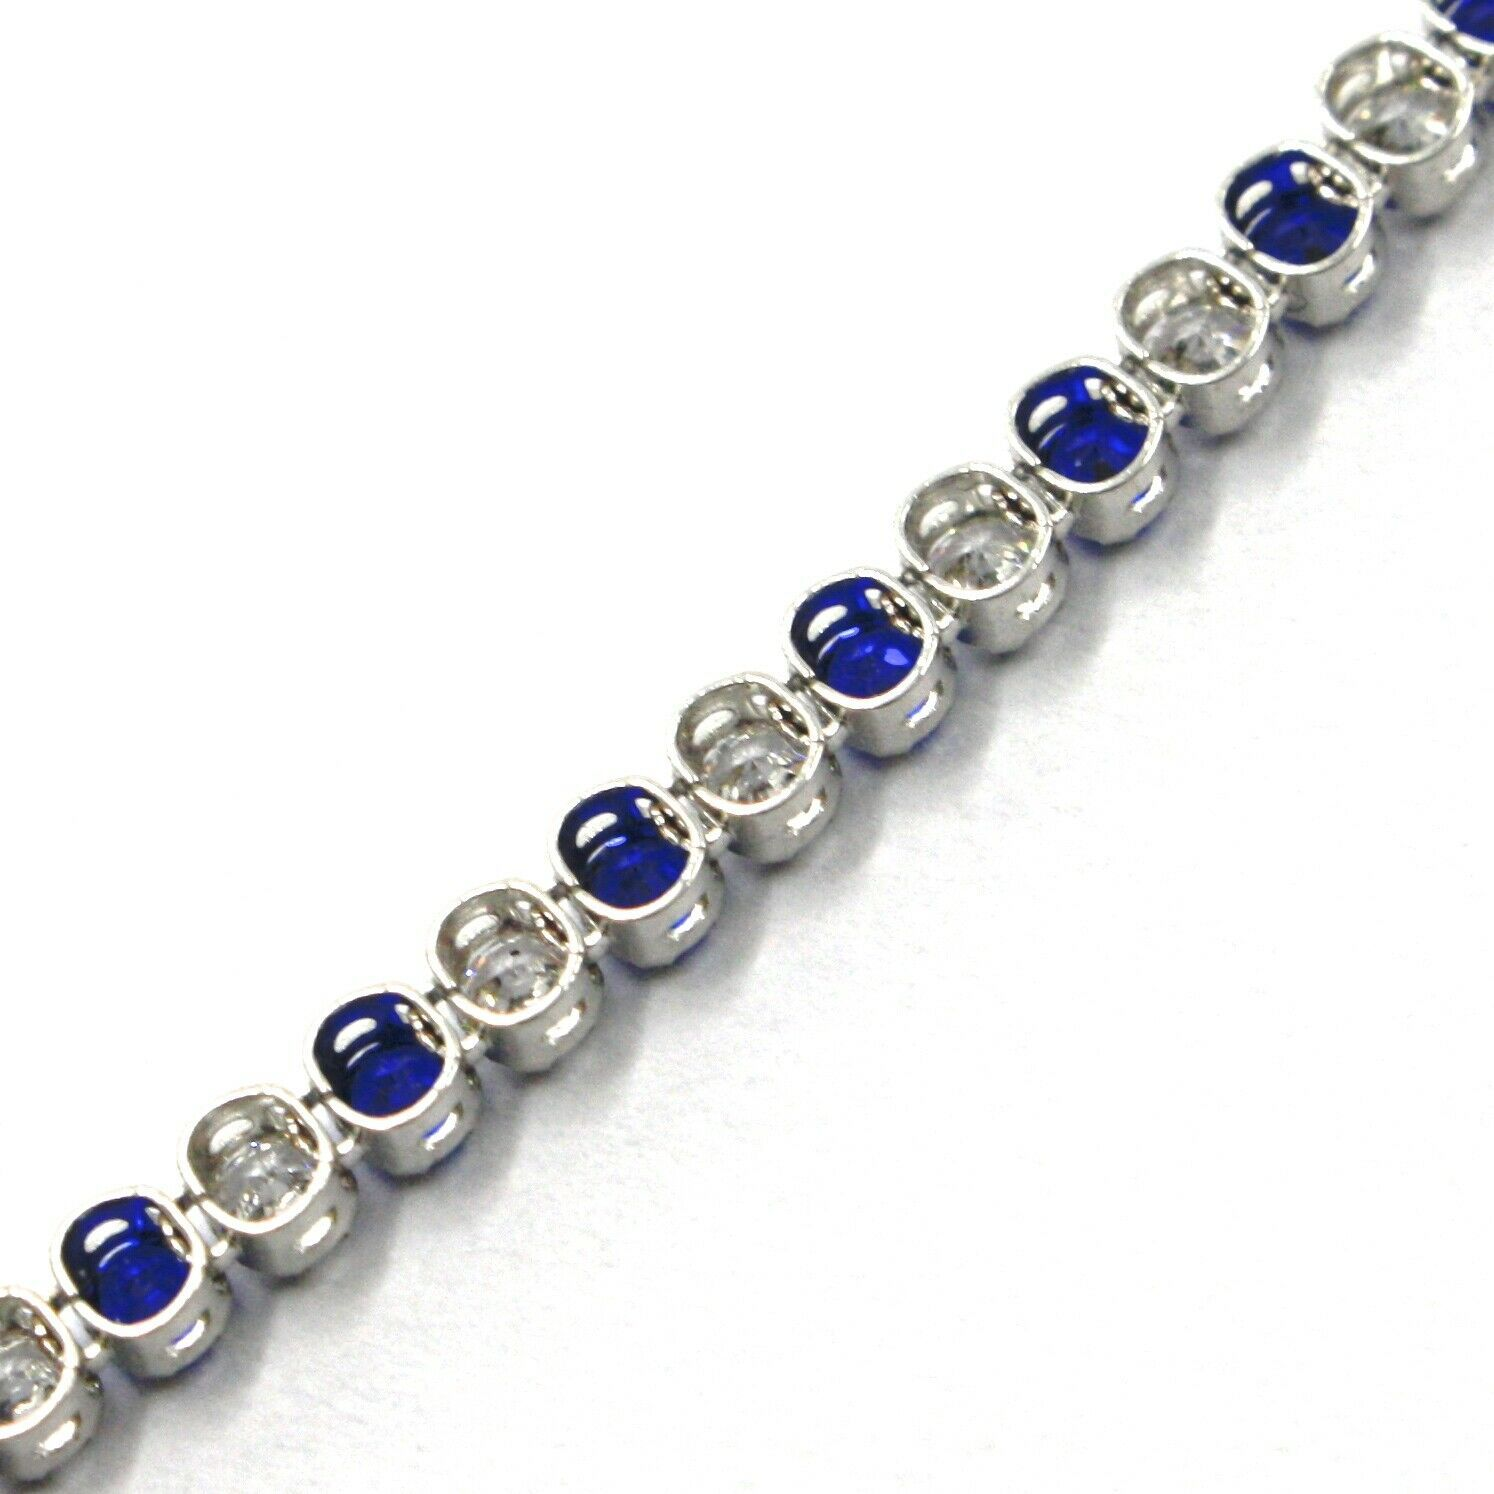 18K WHITE GOLD TENNIS BRACELET BLUE CUBIC ZIRCONIA 2.5mm LOBSTER CLASP CLOSURE image 4